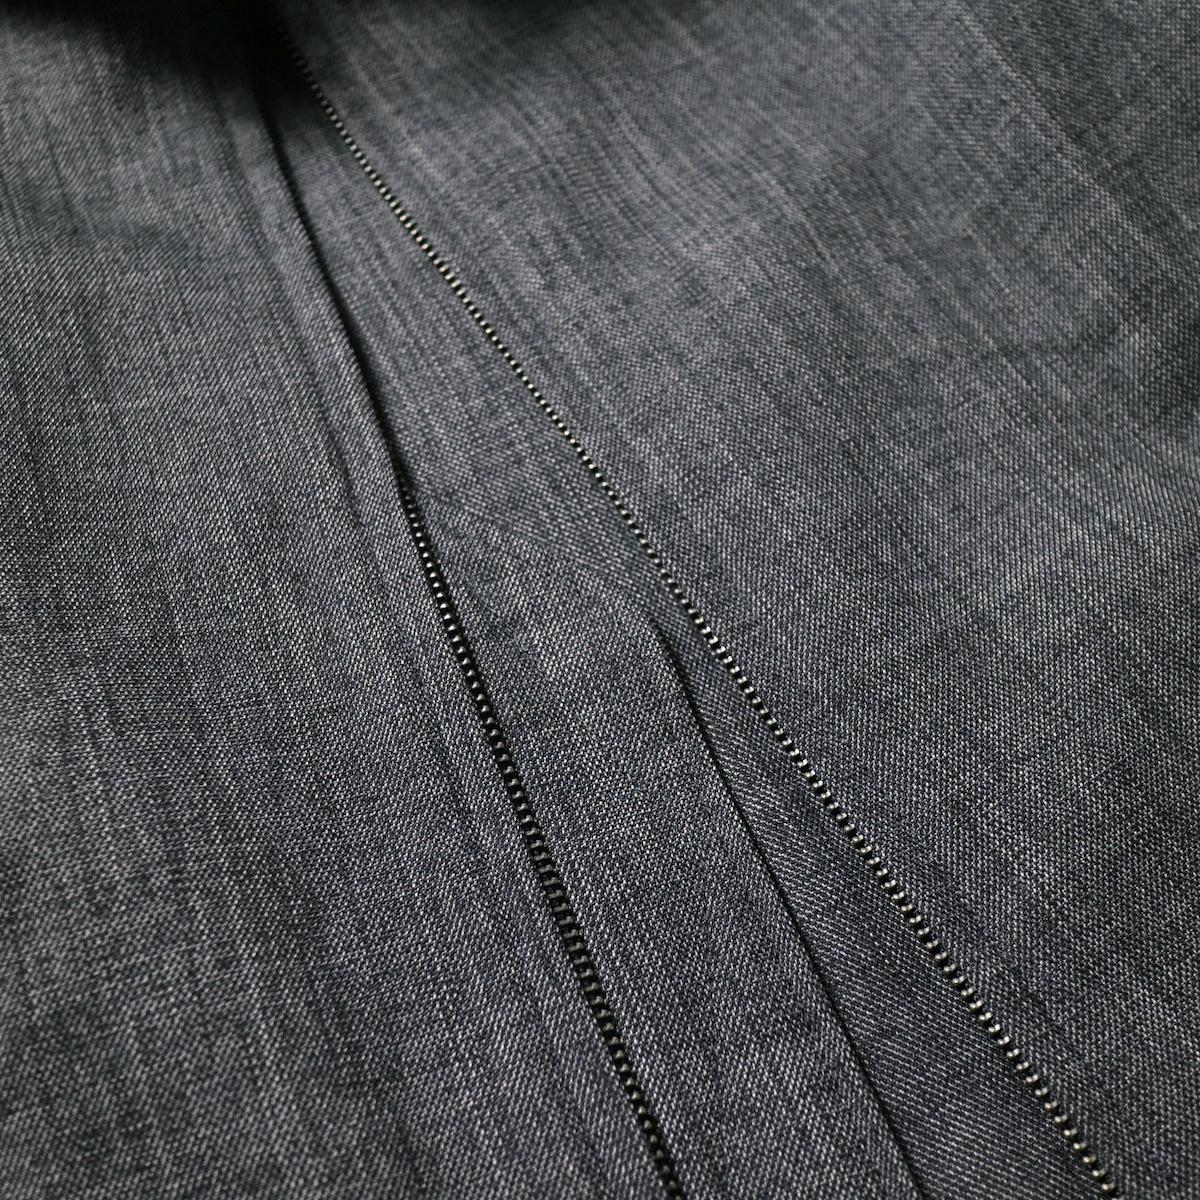 Engineered Garments / Claigton Jacket - Polyester Sharkskin (Charcoal)zip部分